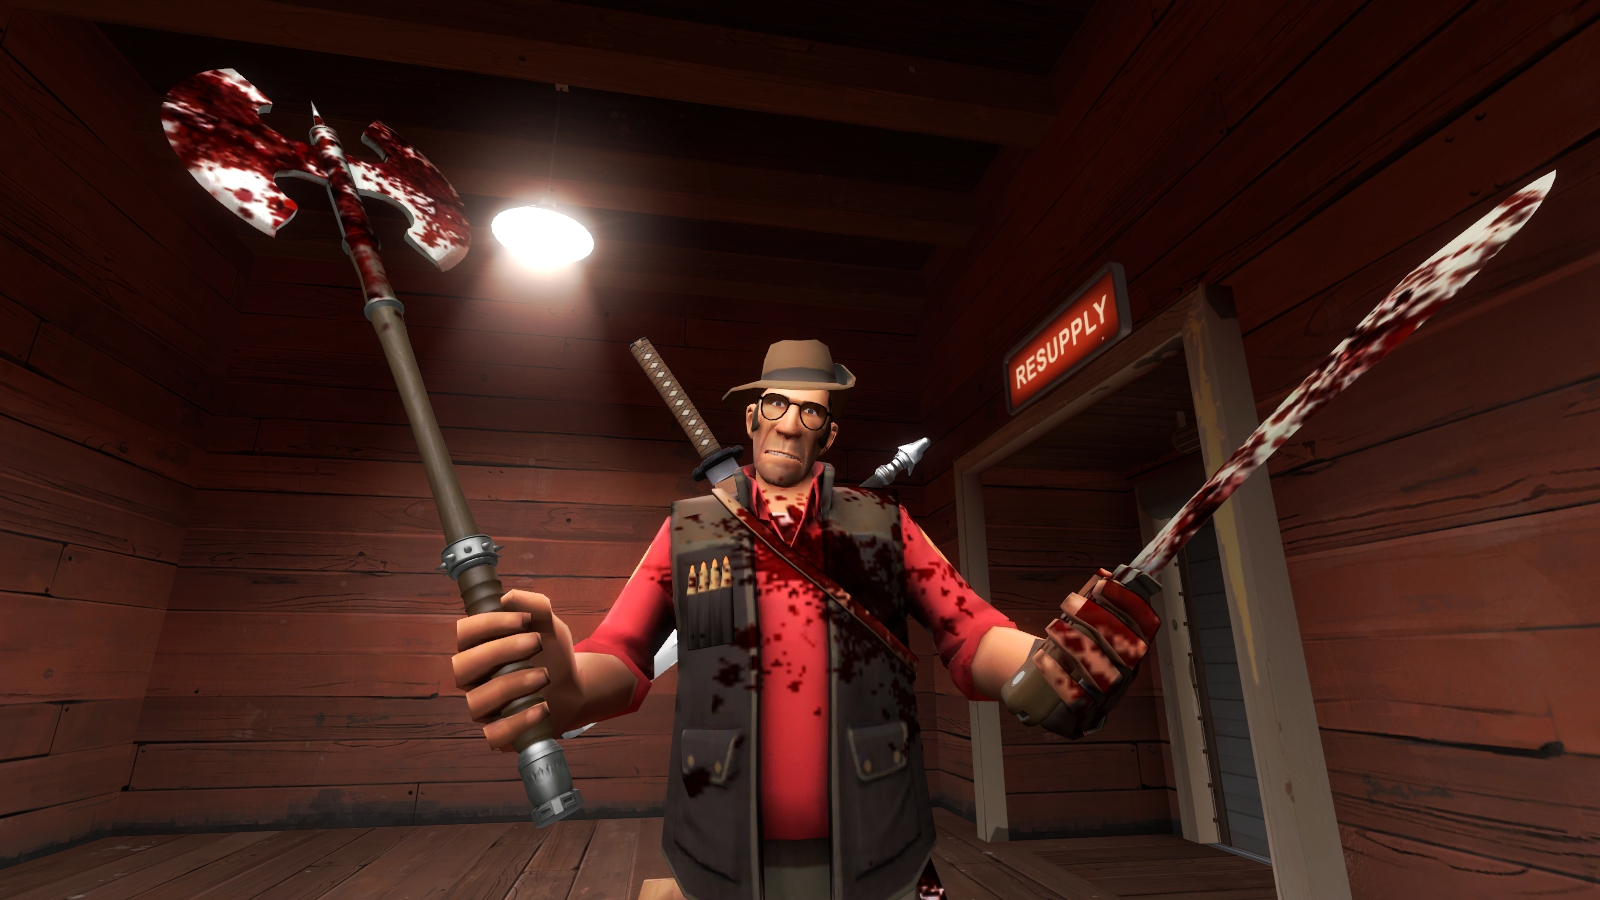 Christian Brutal Sniper | Garry's Mod Wiki | FANDOM powered